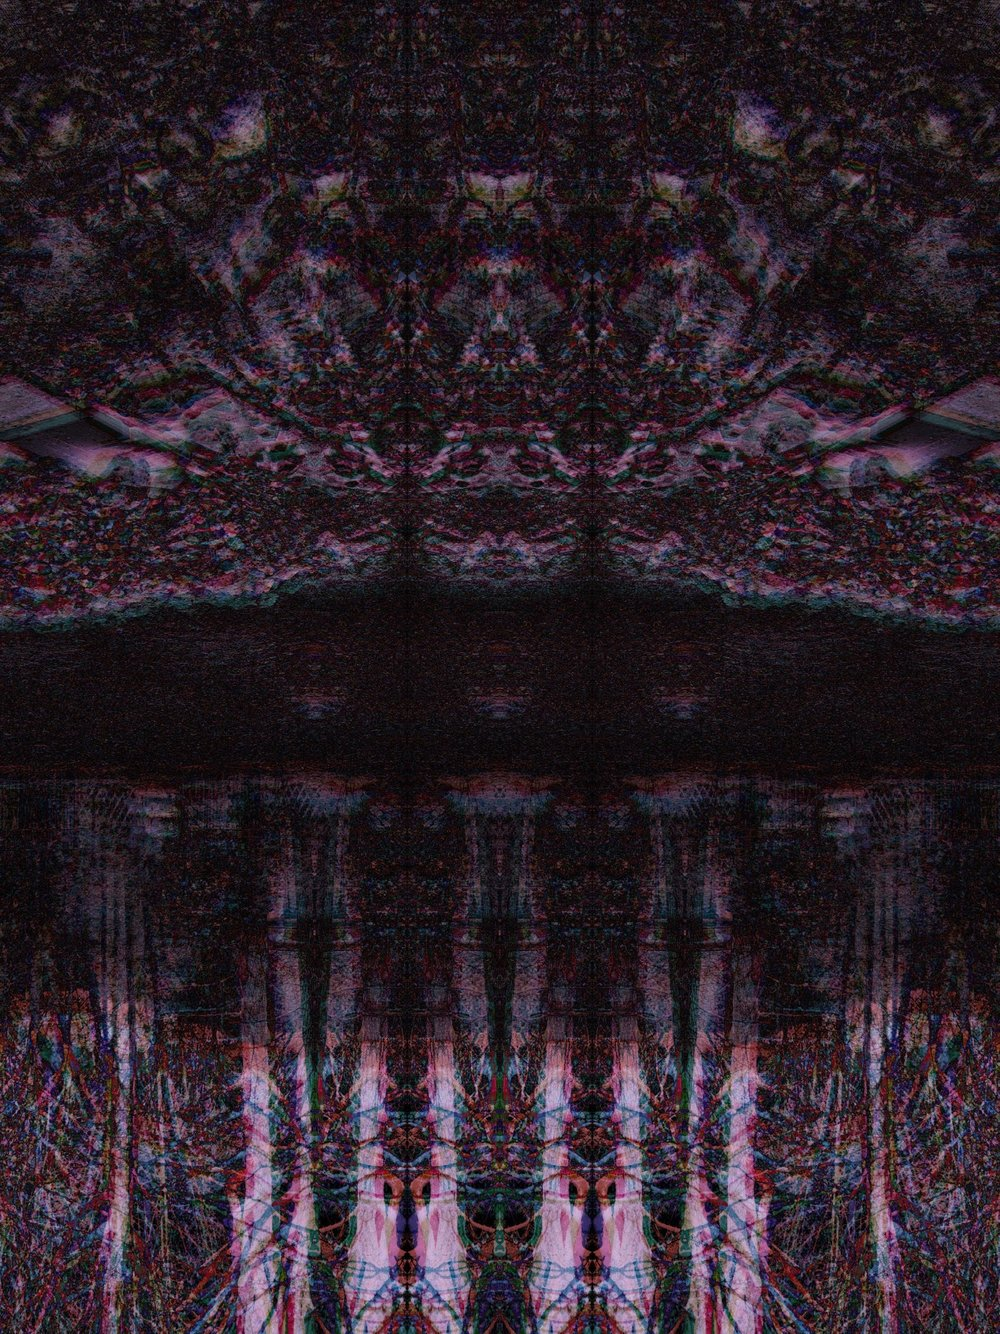 harbingers_brian-moss.jpg